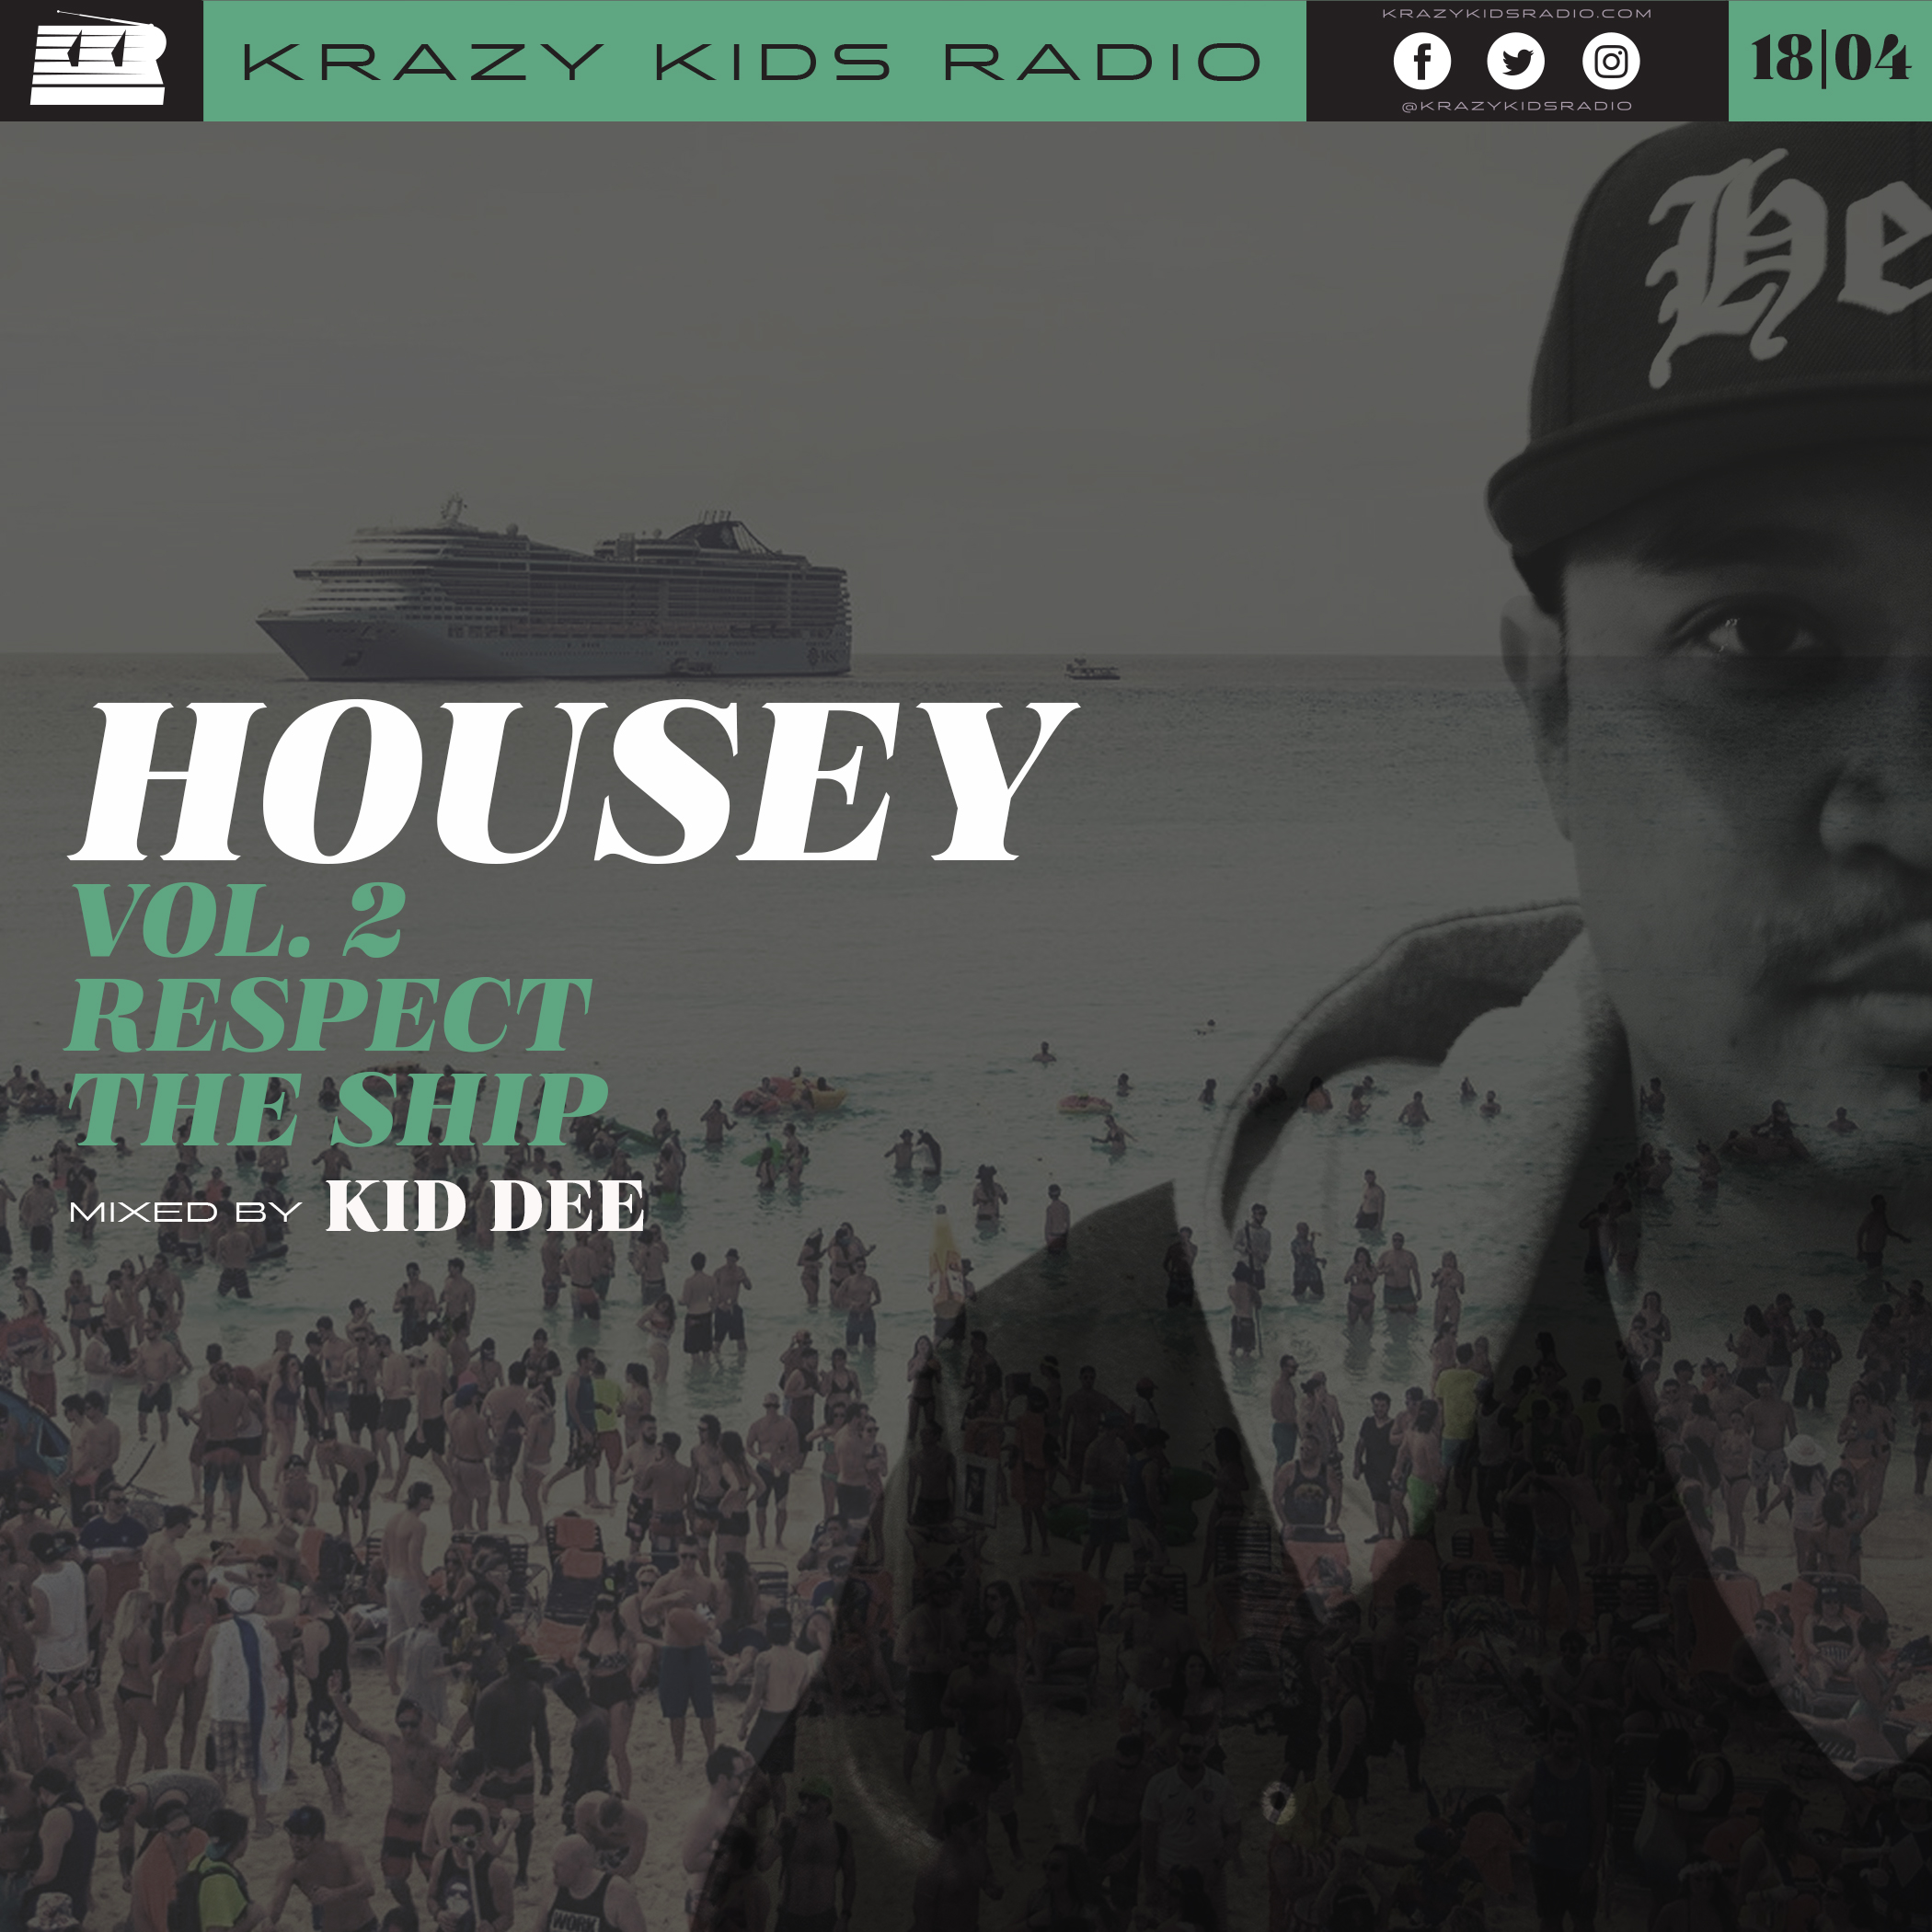 KKR_HOUSEY-VOL-2.jpg